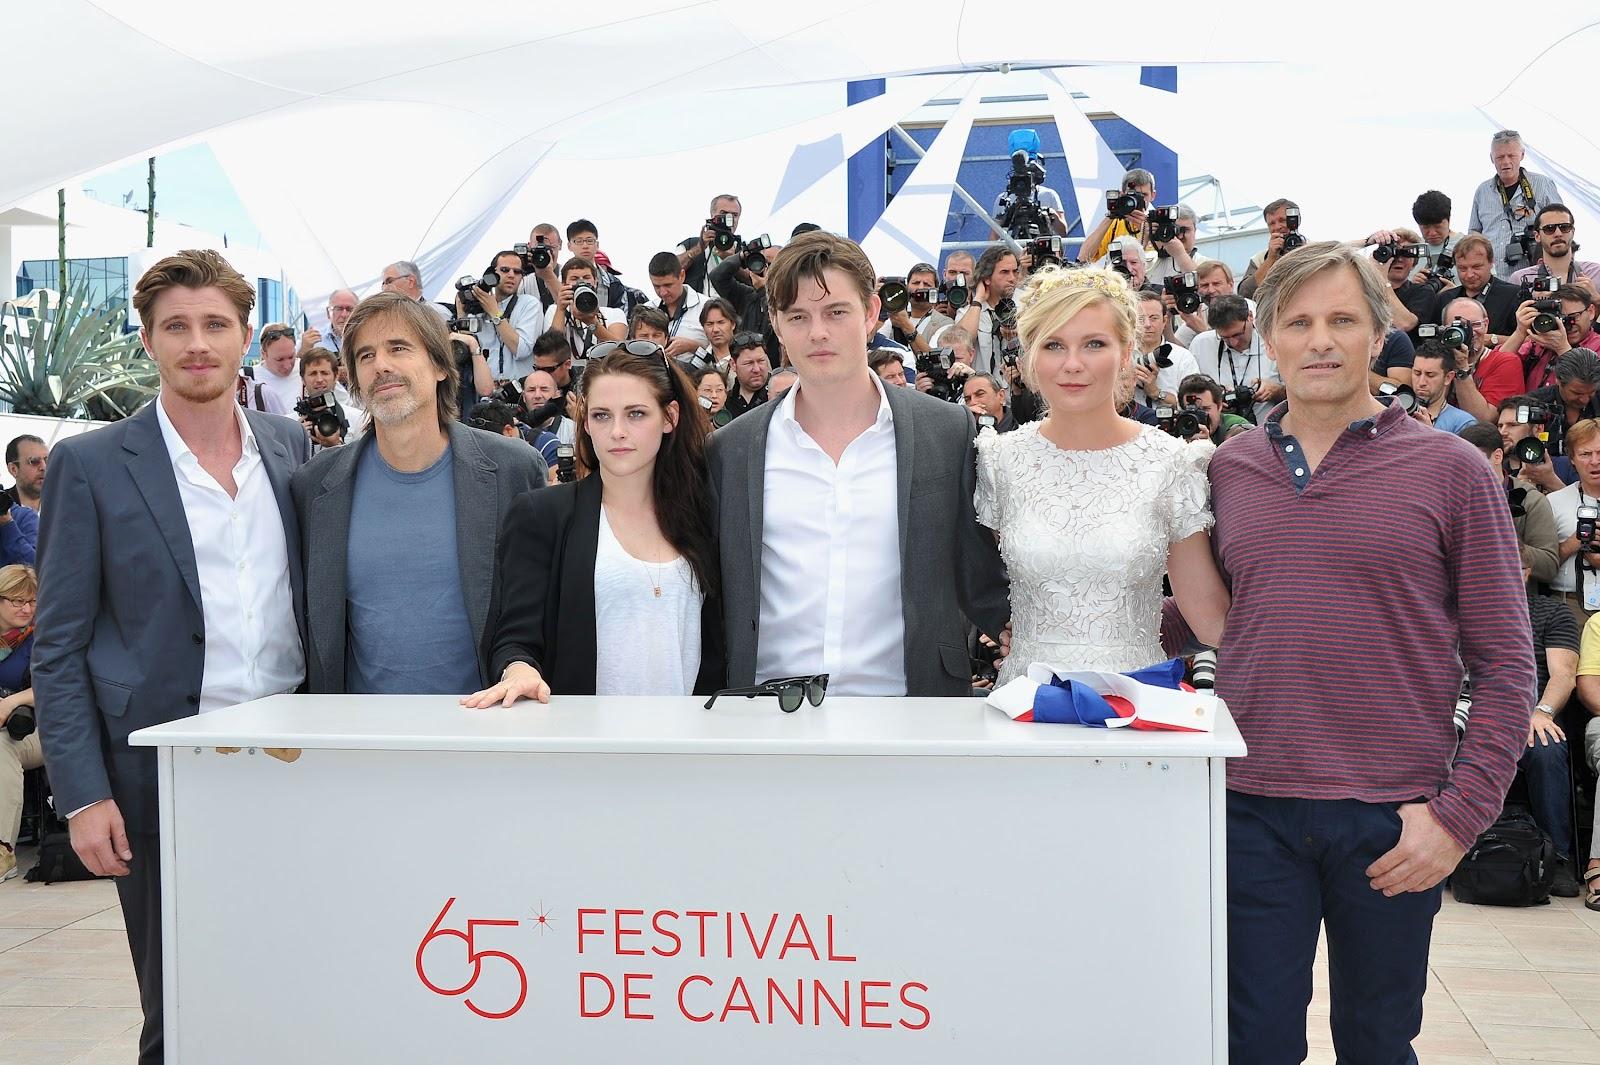 http://3.bp.blogspot.com/--eGzy3SuI0I/T7zNfz9yEdI/AAAAAAAAIW8/-Ri9MT7FVOs/s1600/Cannes+photocall+13+hq.jpg